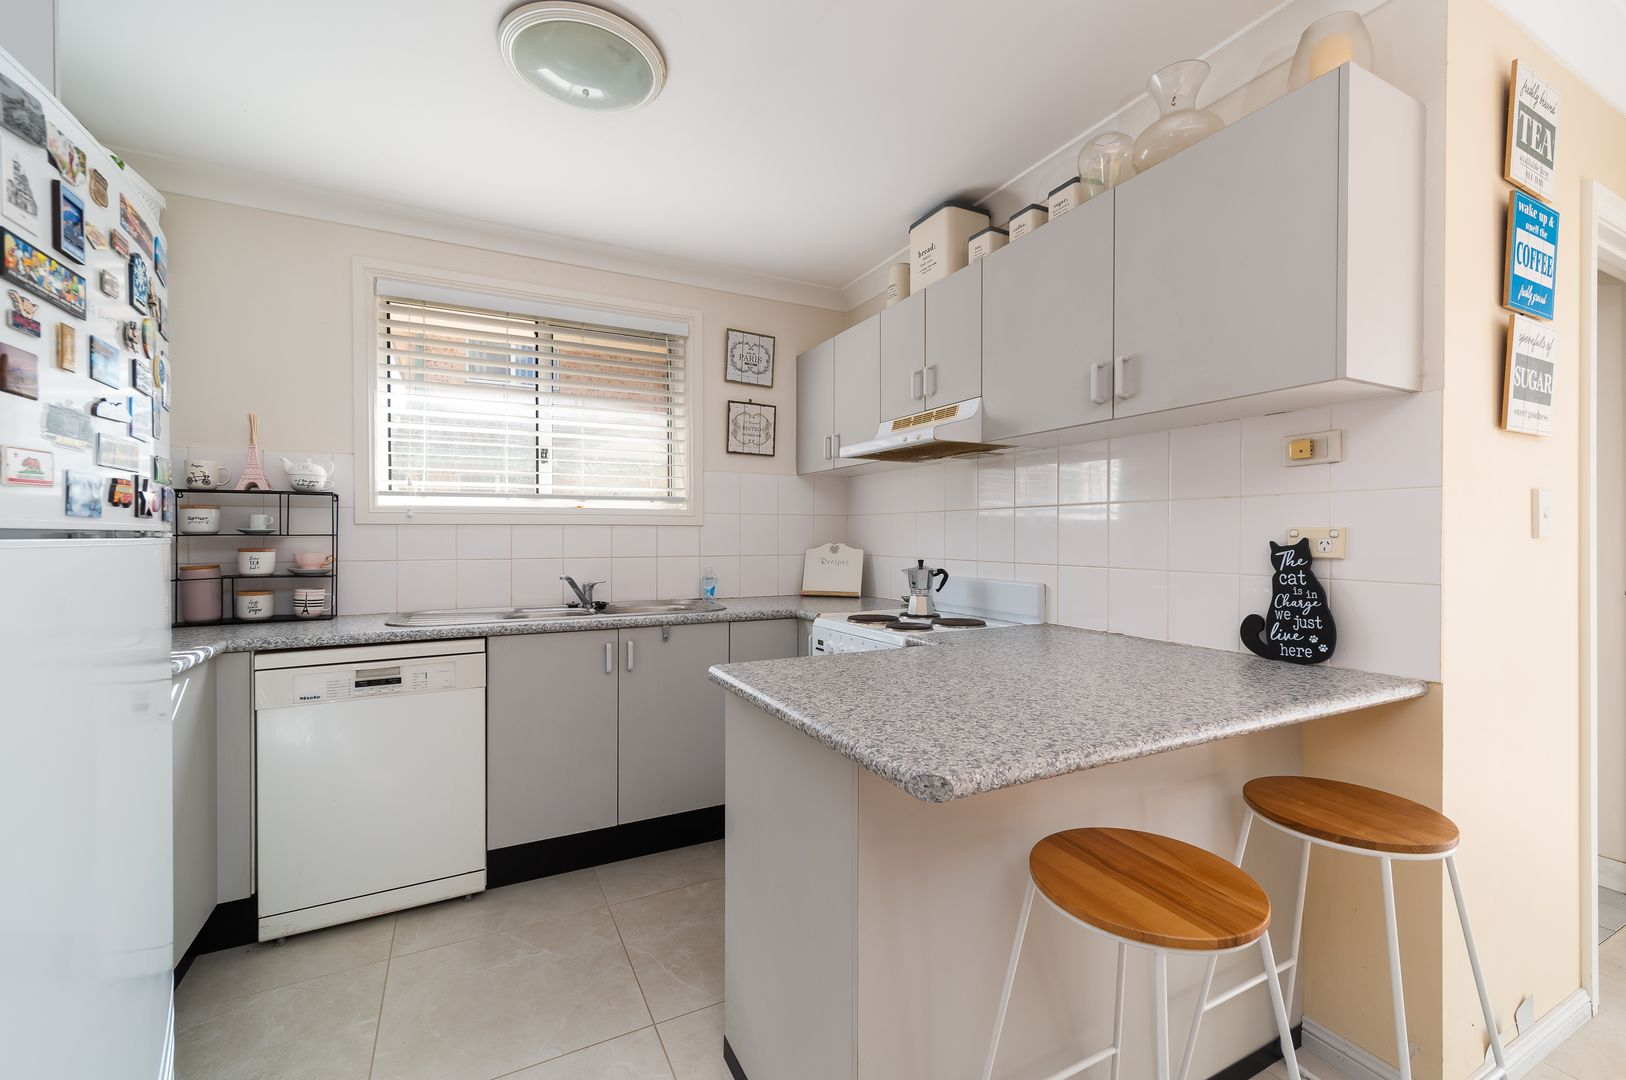 18/59-61 Devenish Street, Greenfield Park NSW 2176, Image 1